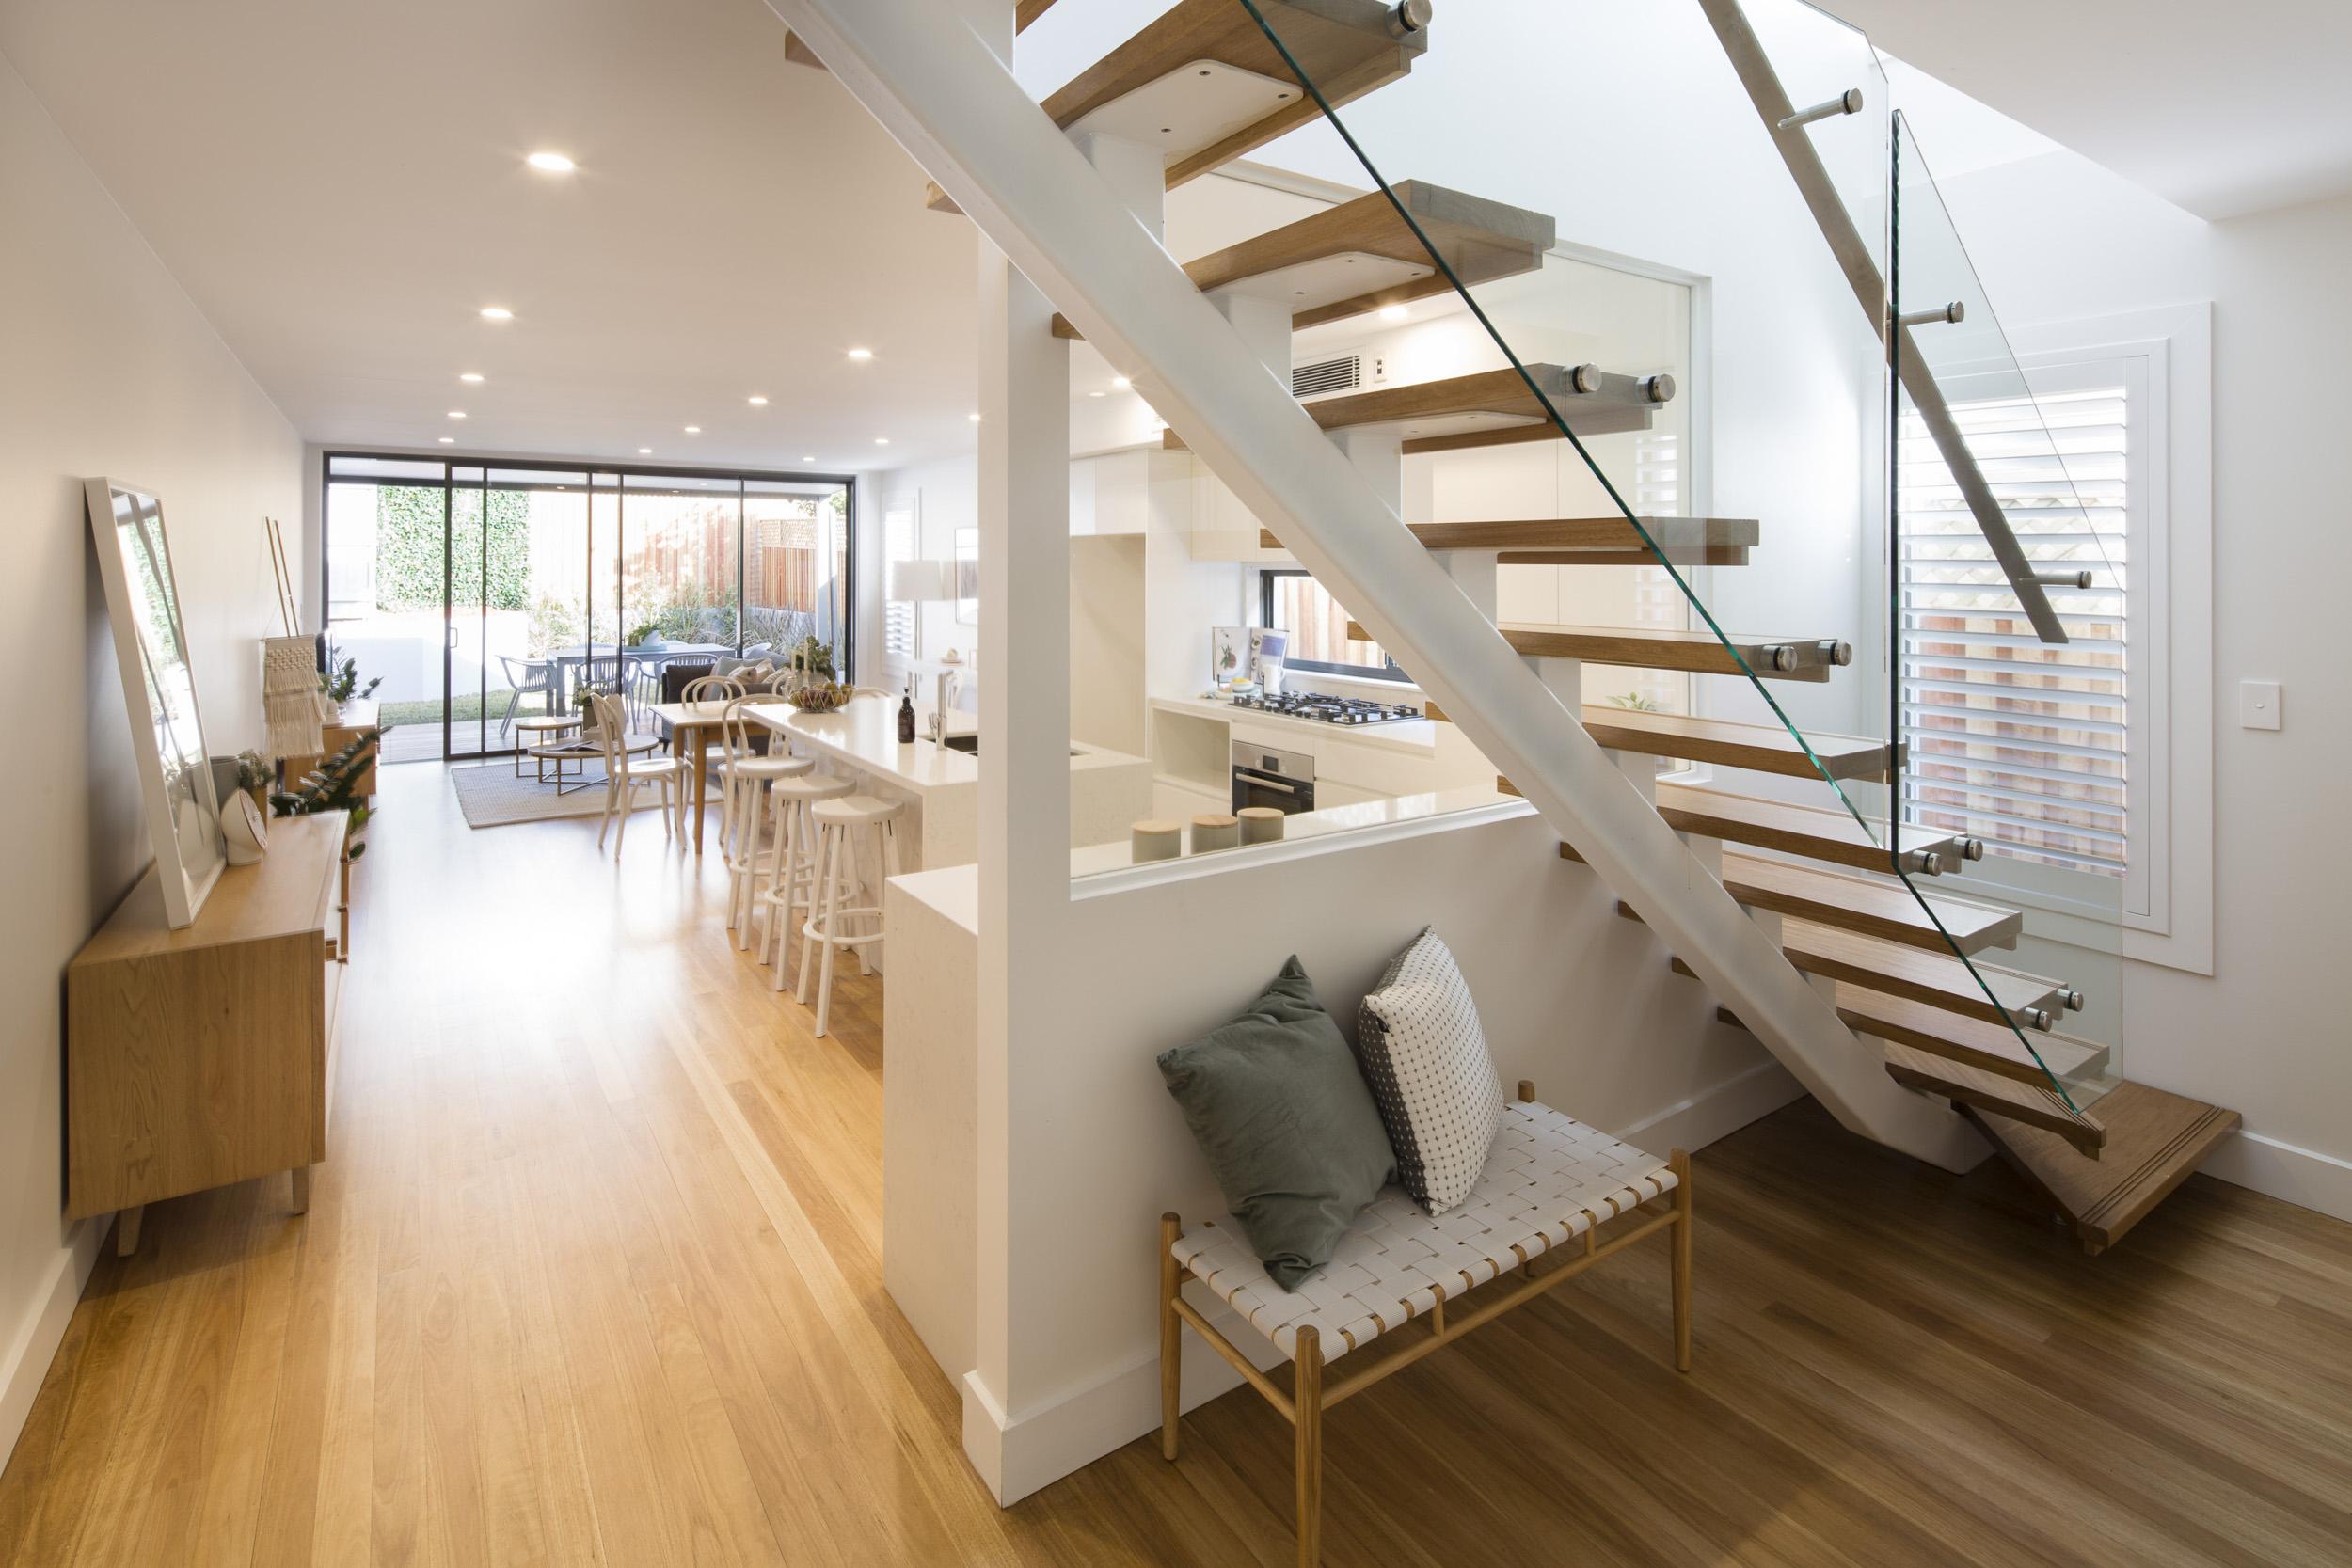 house_photographer_sydney_ns_studio_architects_12.jpg